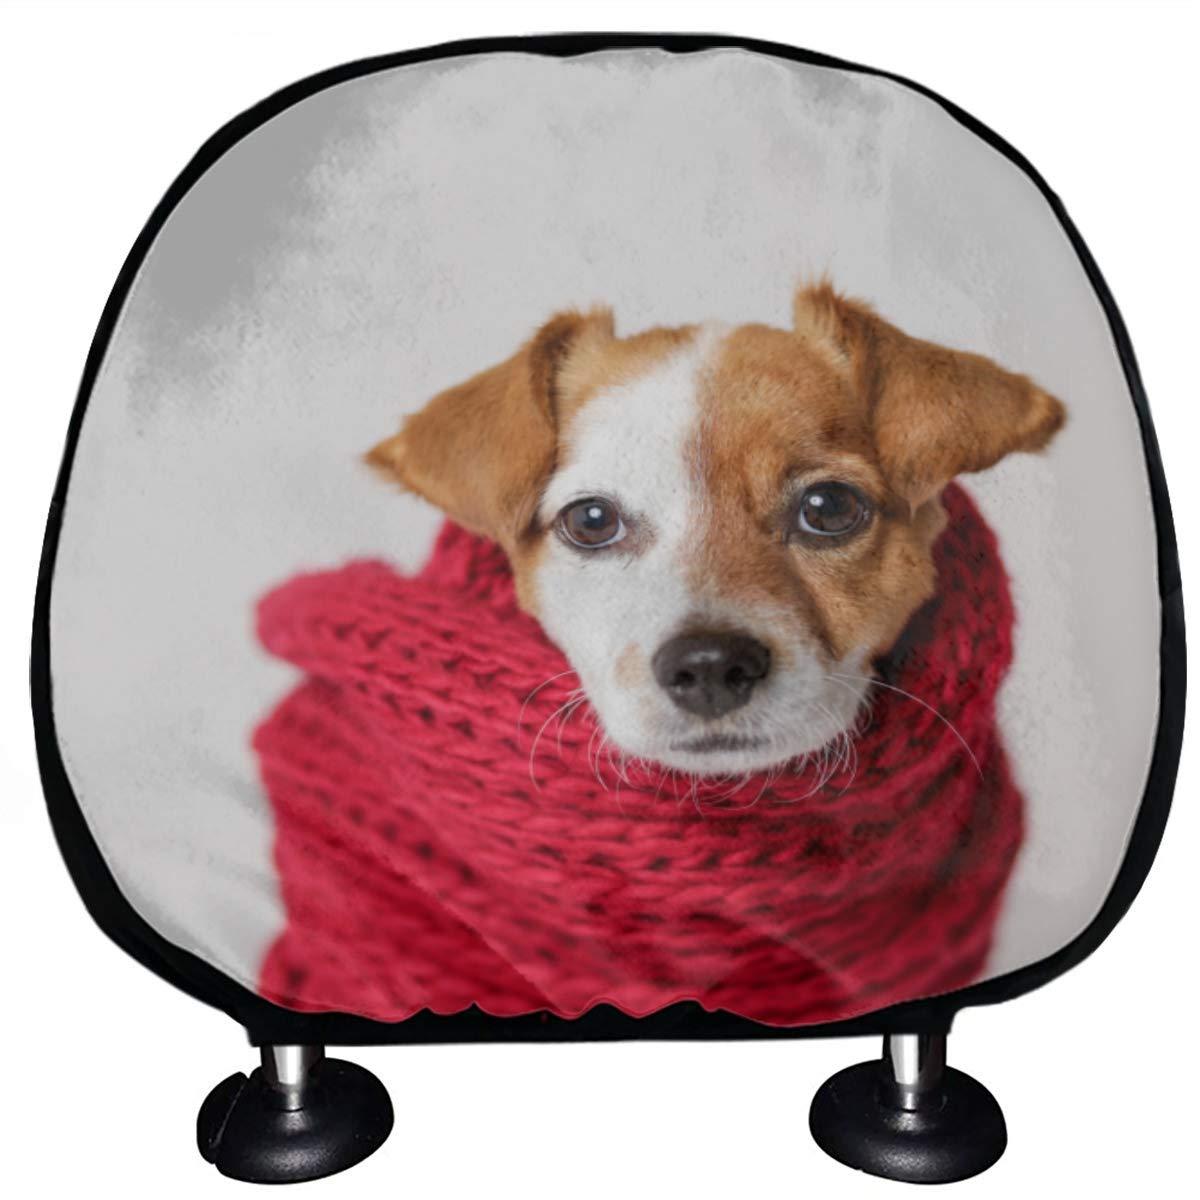 Car Headrest Protector Fashionable Cool Scarf Dog Headrest Protector for Cars Set of 2 Universal Fit for Cars Vans Trucks Headrest Cushion Fashion Auto Interior Accessories